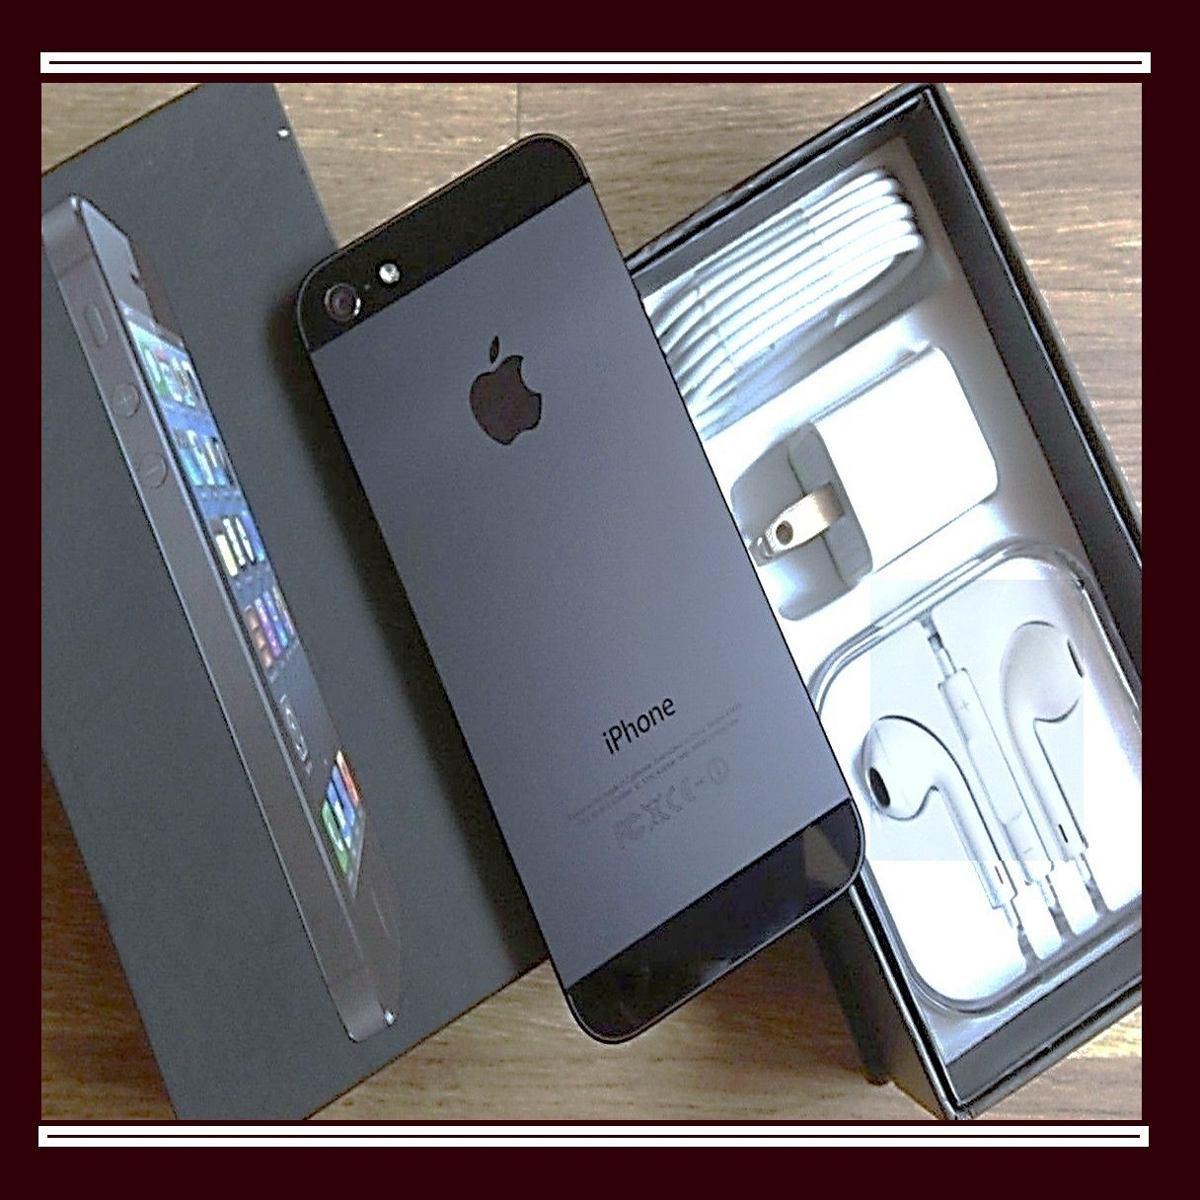 Comprar caja iphone 5